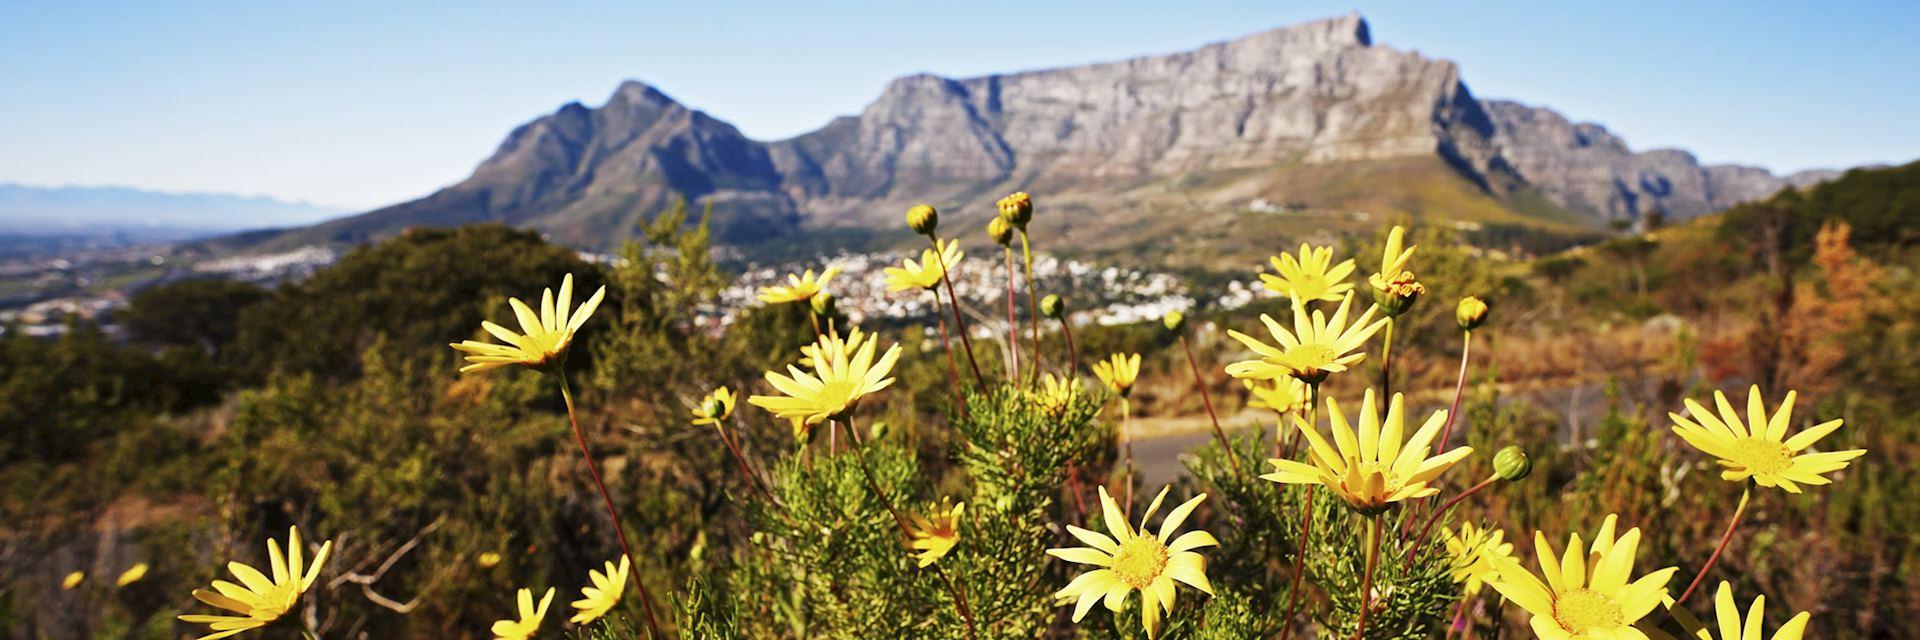 Vegetation, Cape Region, South Africa